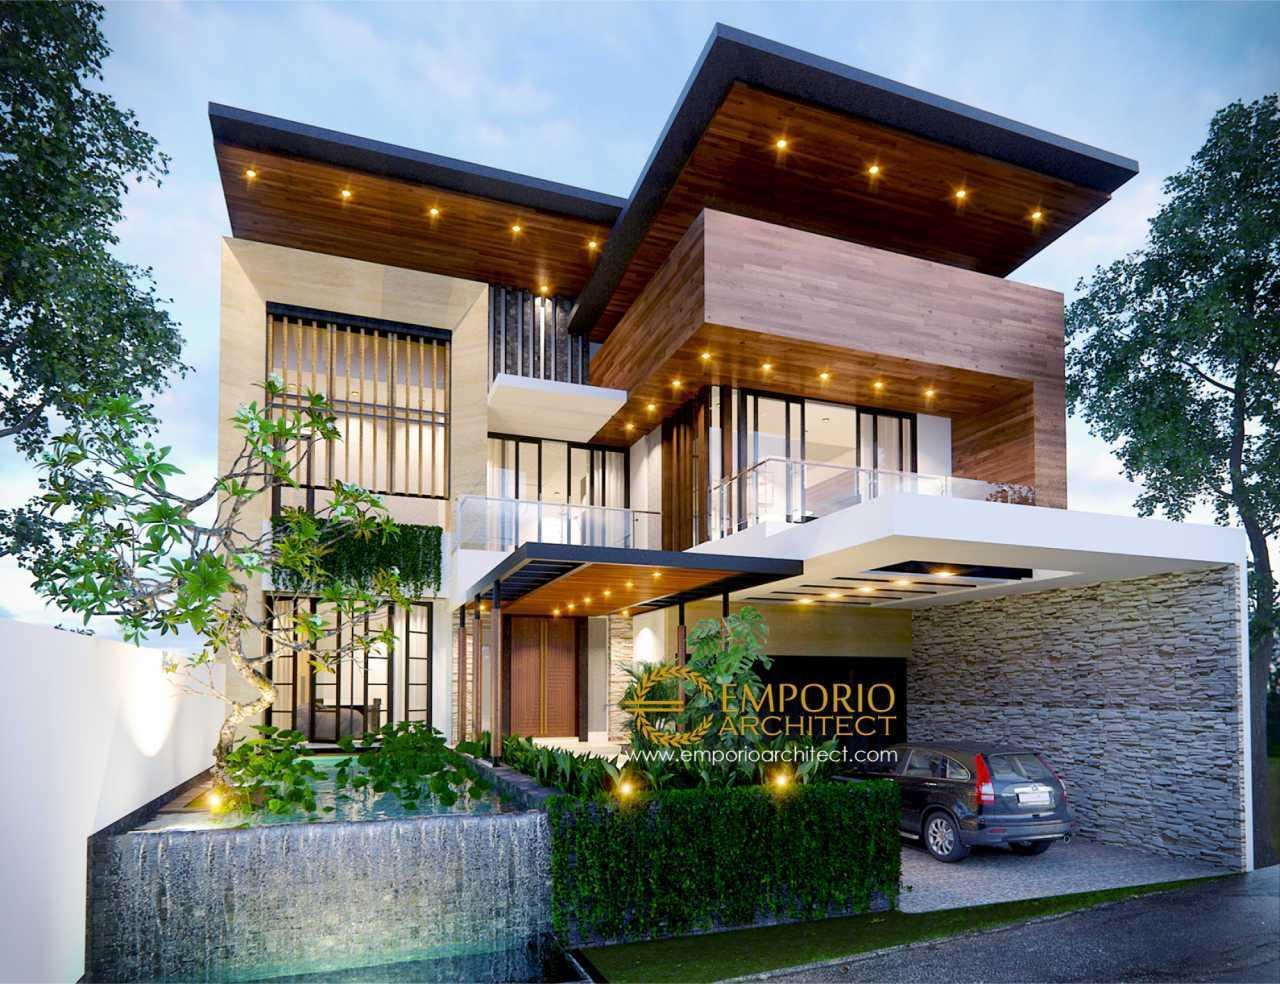 Emporio Architect Jasa Arsitek Bandung Desain Rumah Modern 2 Lantai 373 @ Bandung Bandung, Kota Bandung, Jawa Barat, Indonesia Bandung, Kota Bandung, Jawa Barat, Indonesia Emporio-Architect-Jasa-Arsitek-Bandung-Desain-Rumah-Modern-2-Lantai-373-Bandung Modern 90940